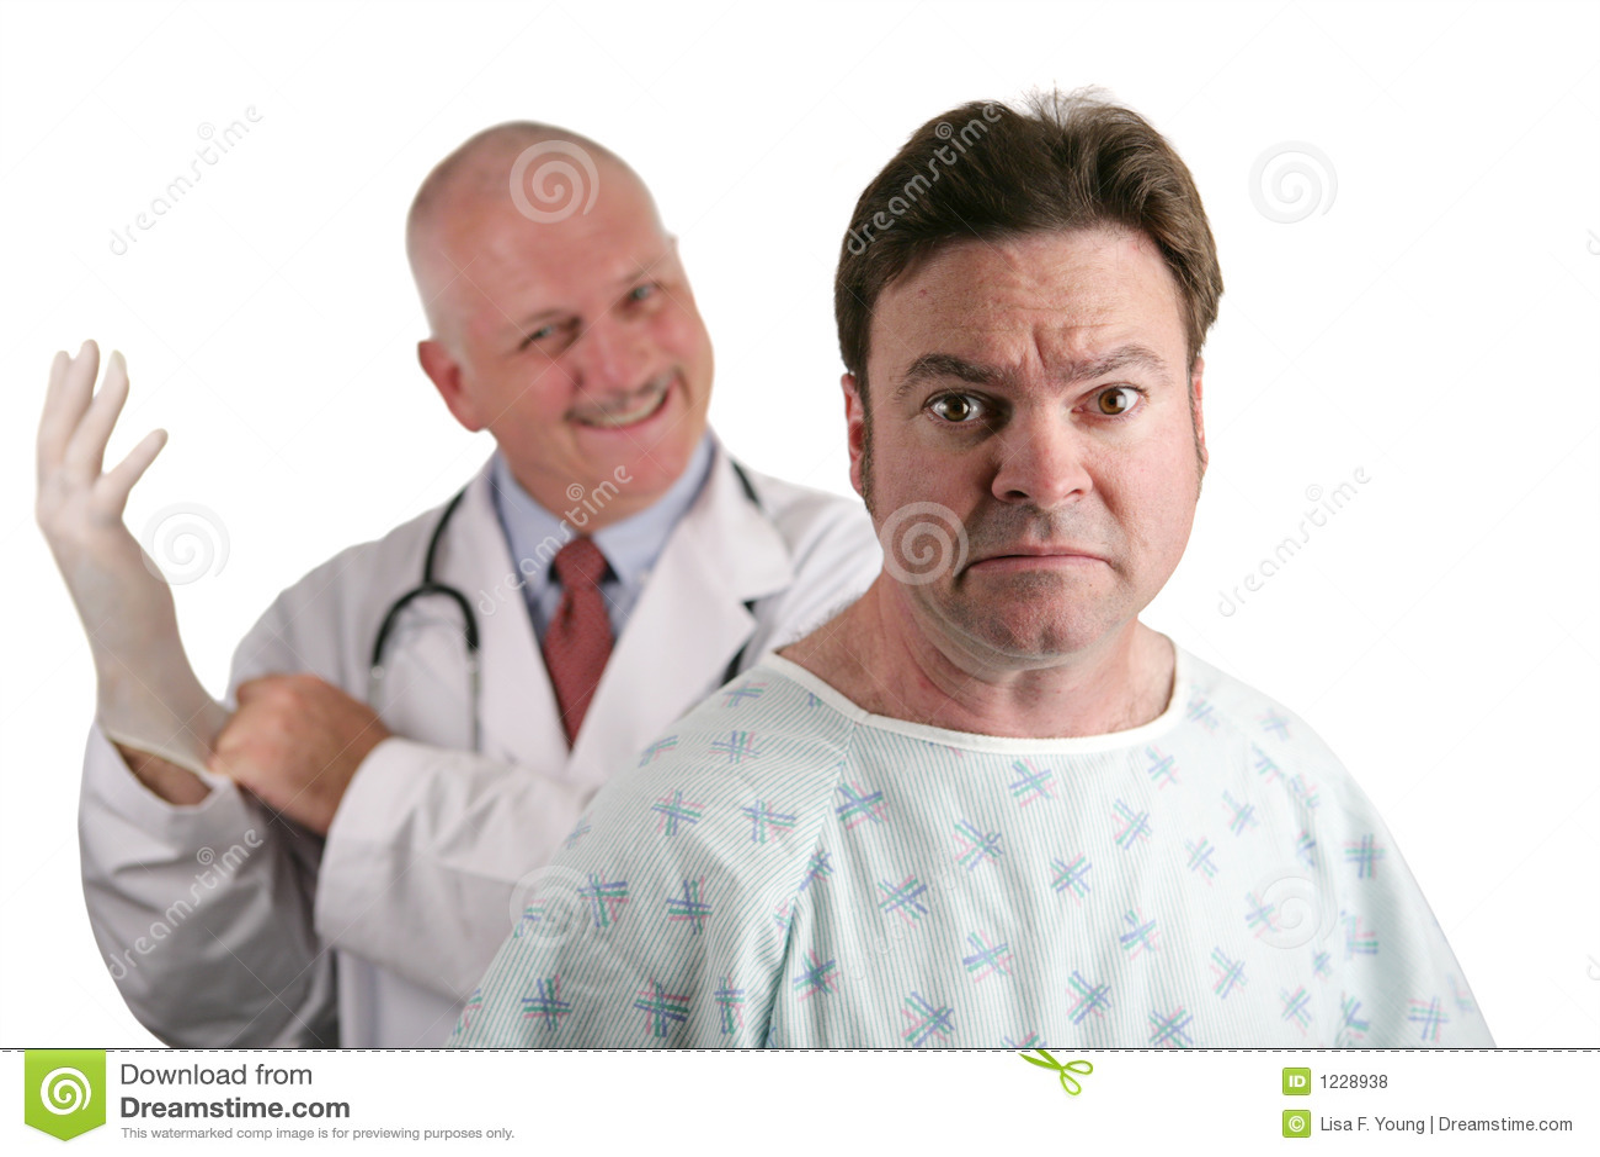 Premier examen de prostate